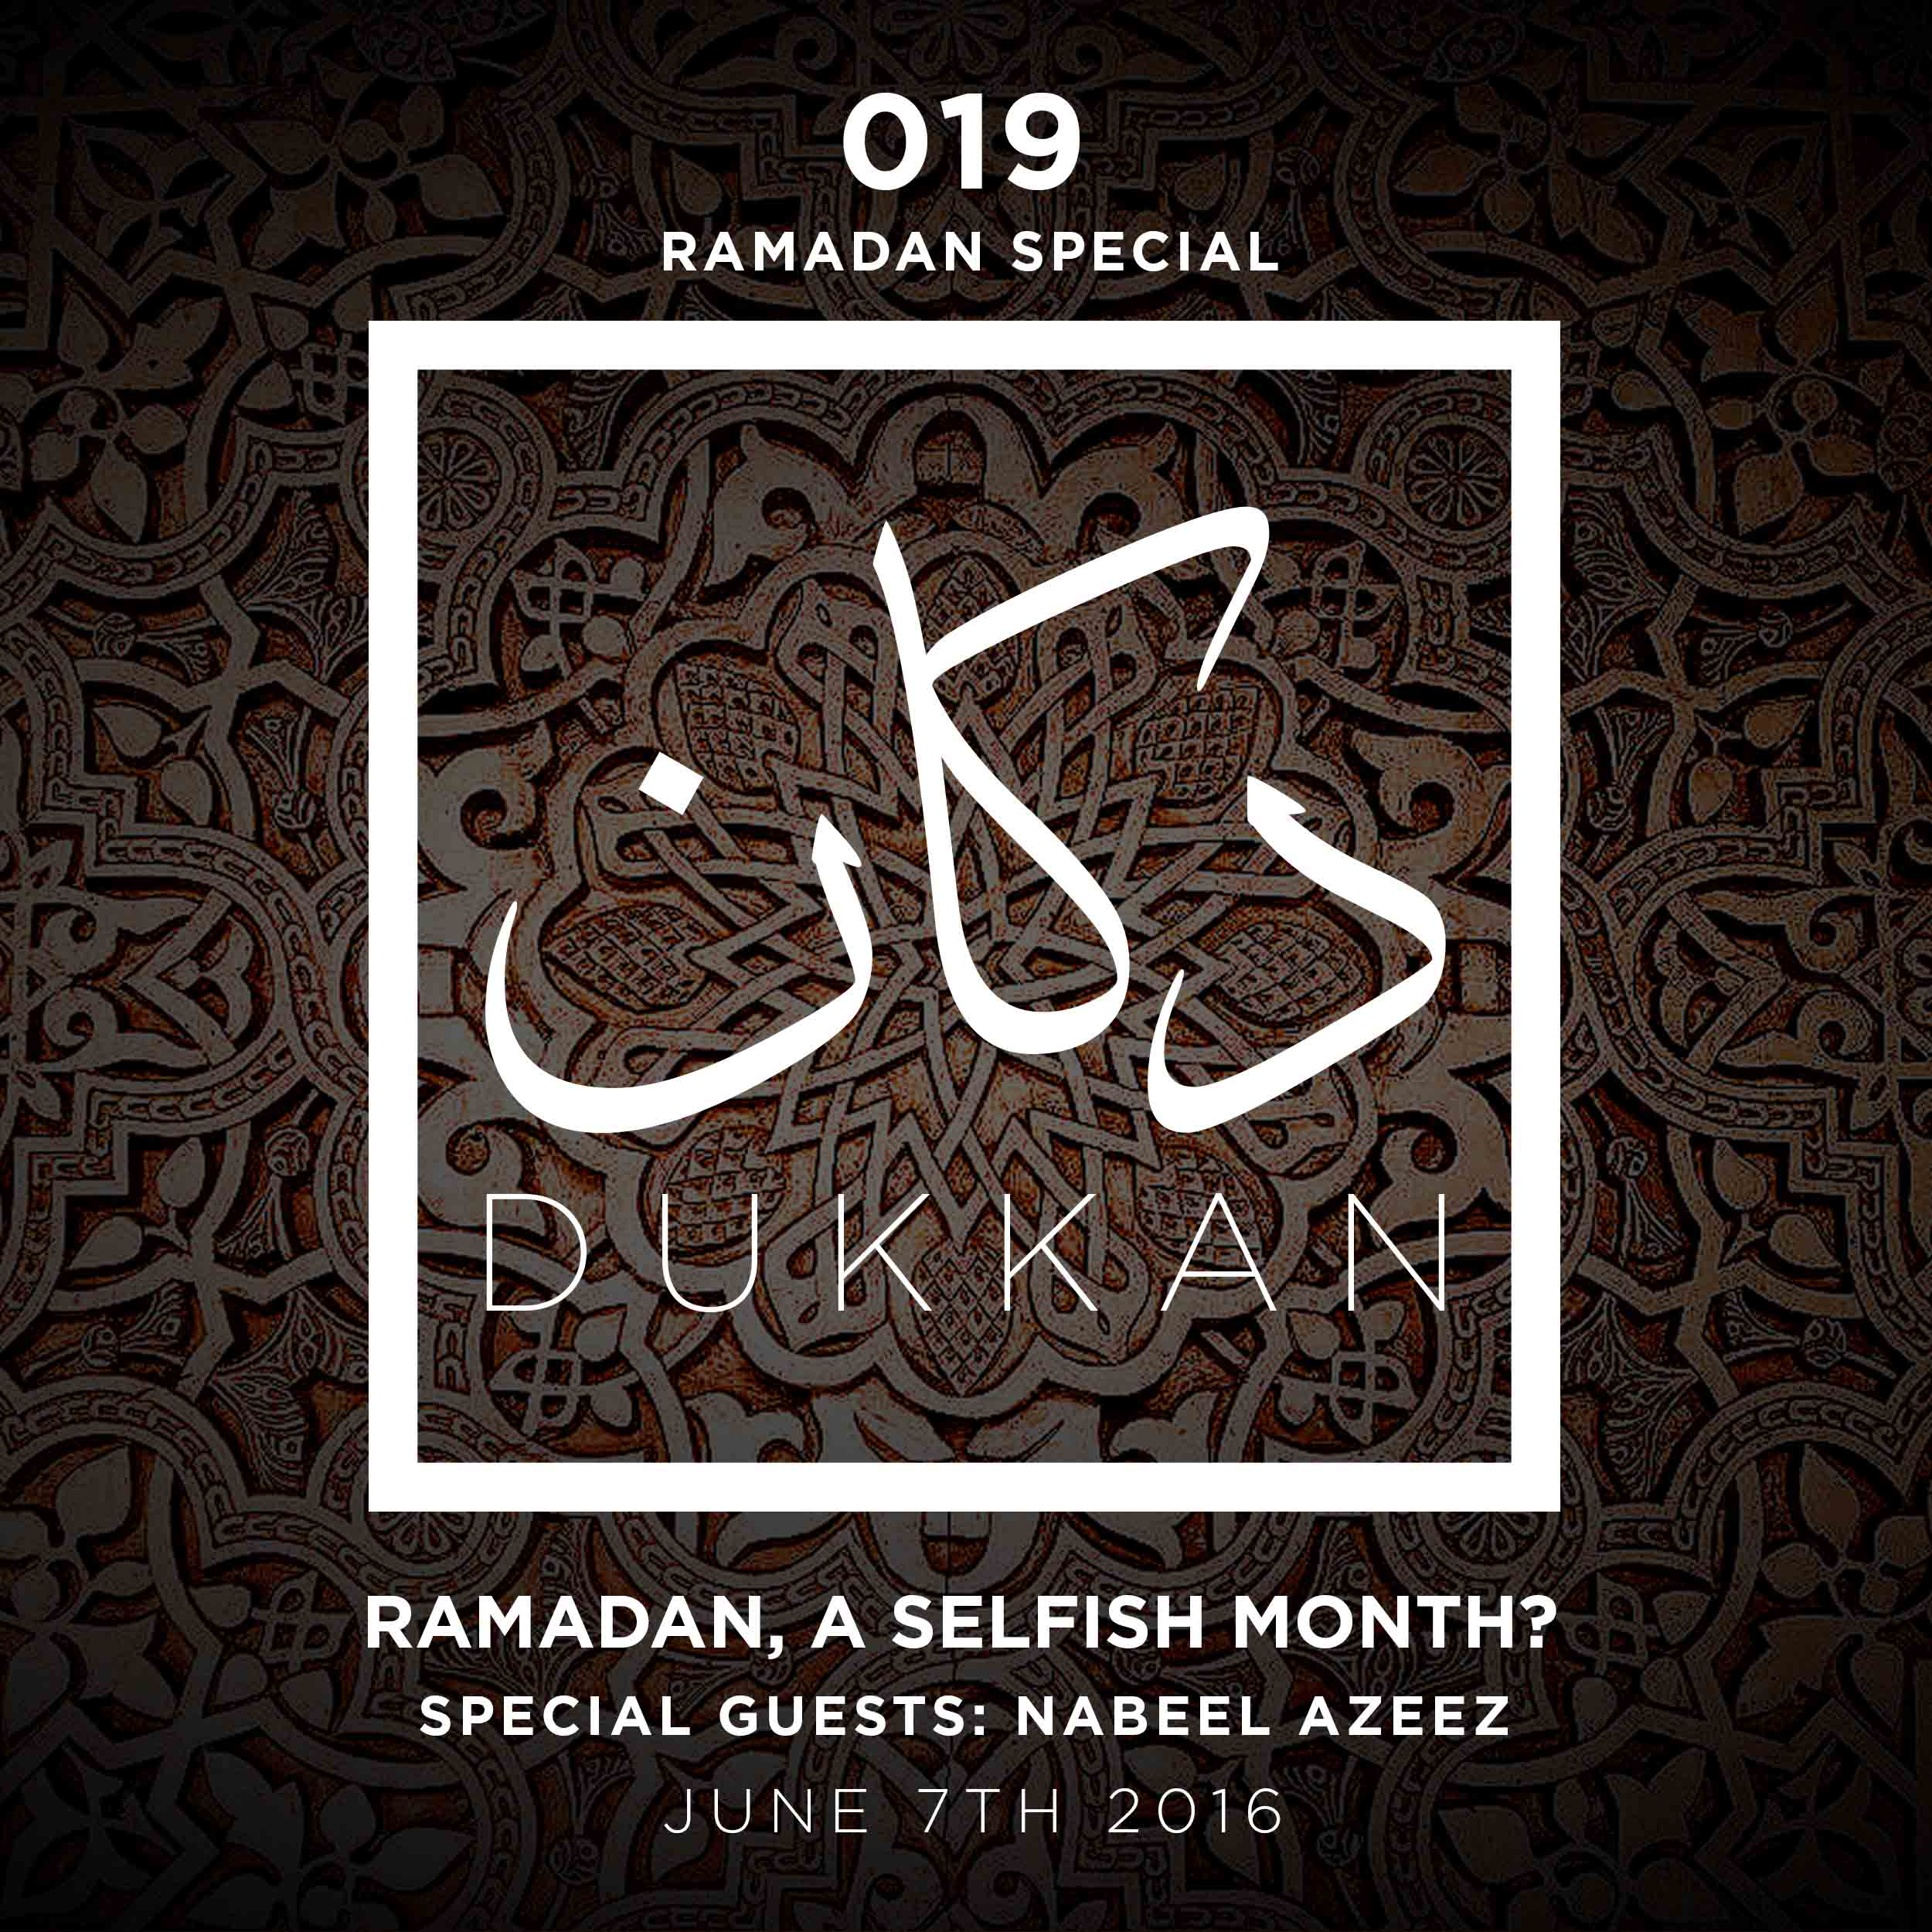 ramadan, a selfish month?